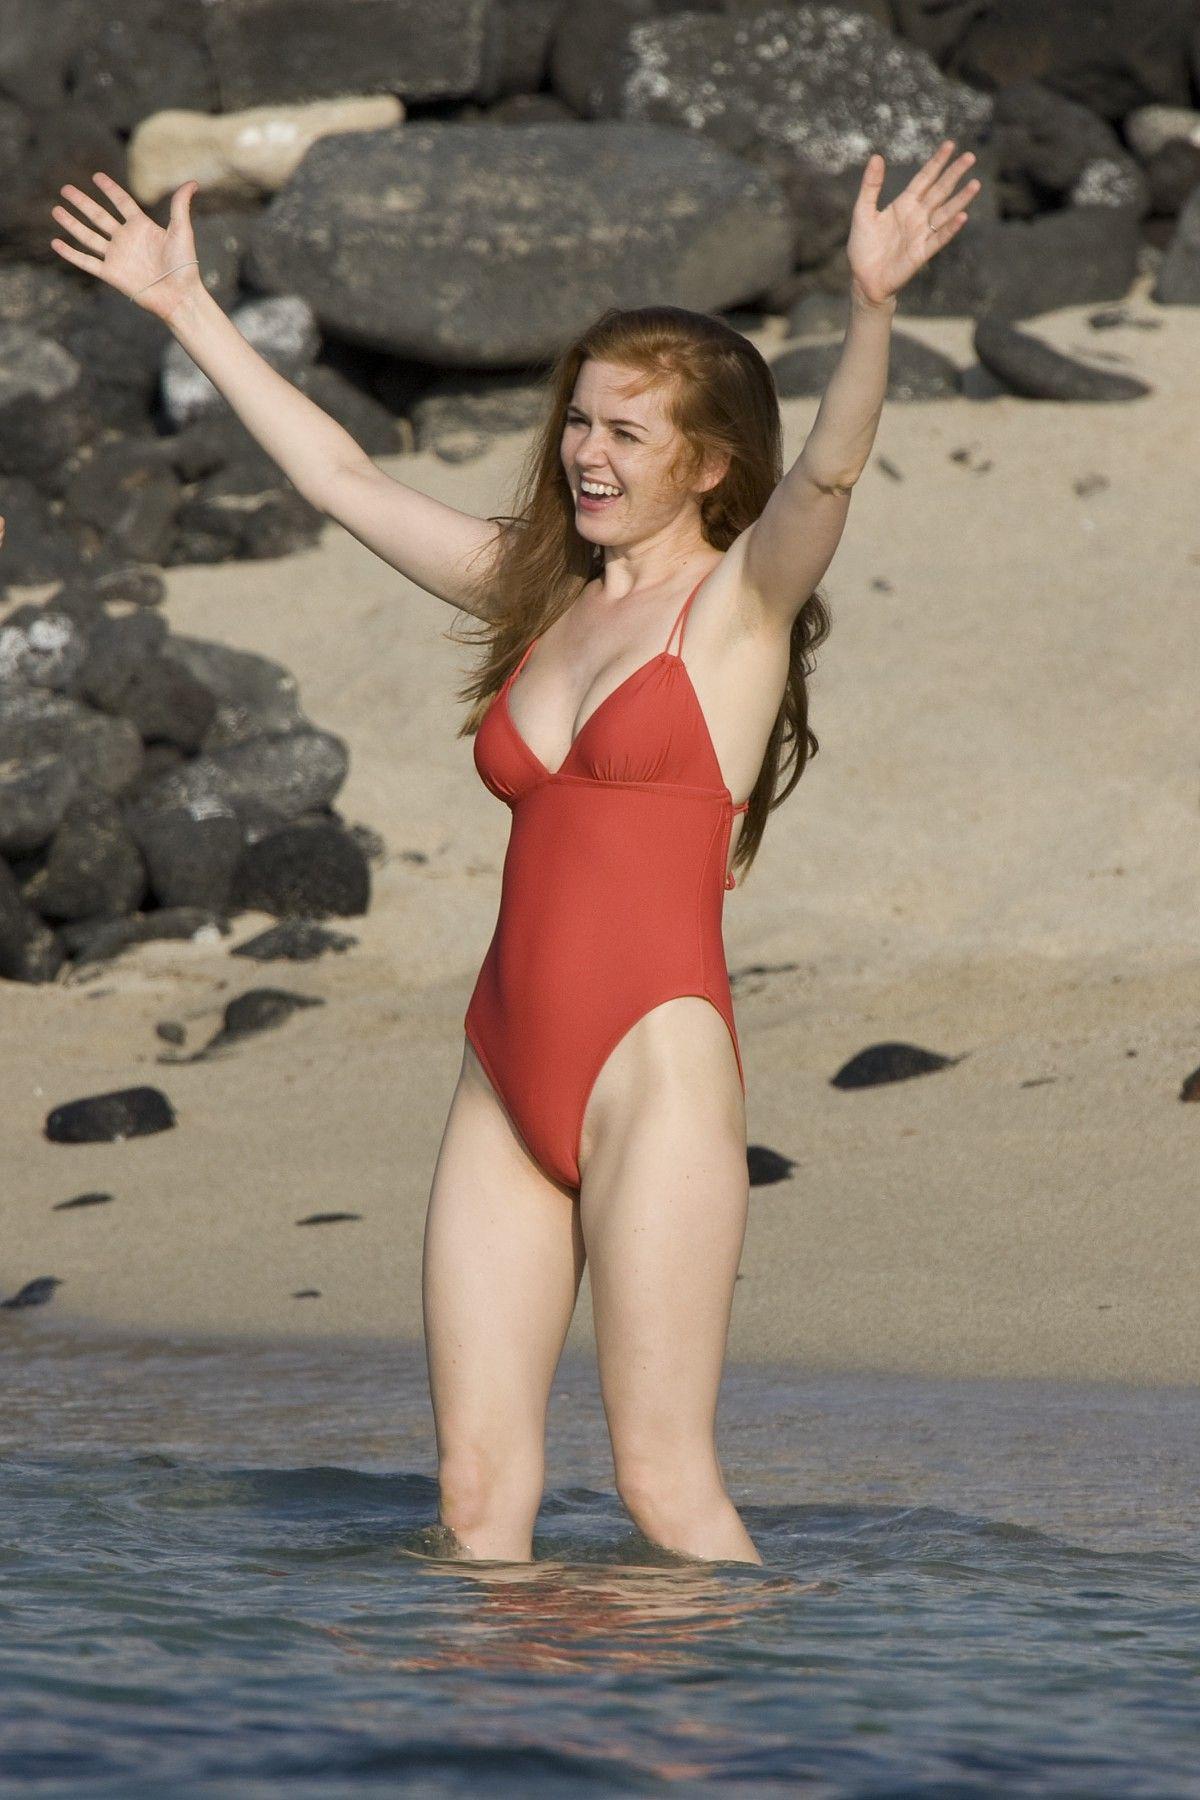 hot latinas swimsuits beaches